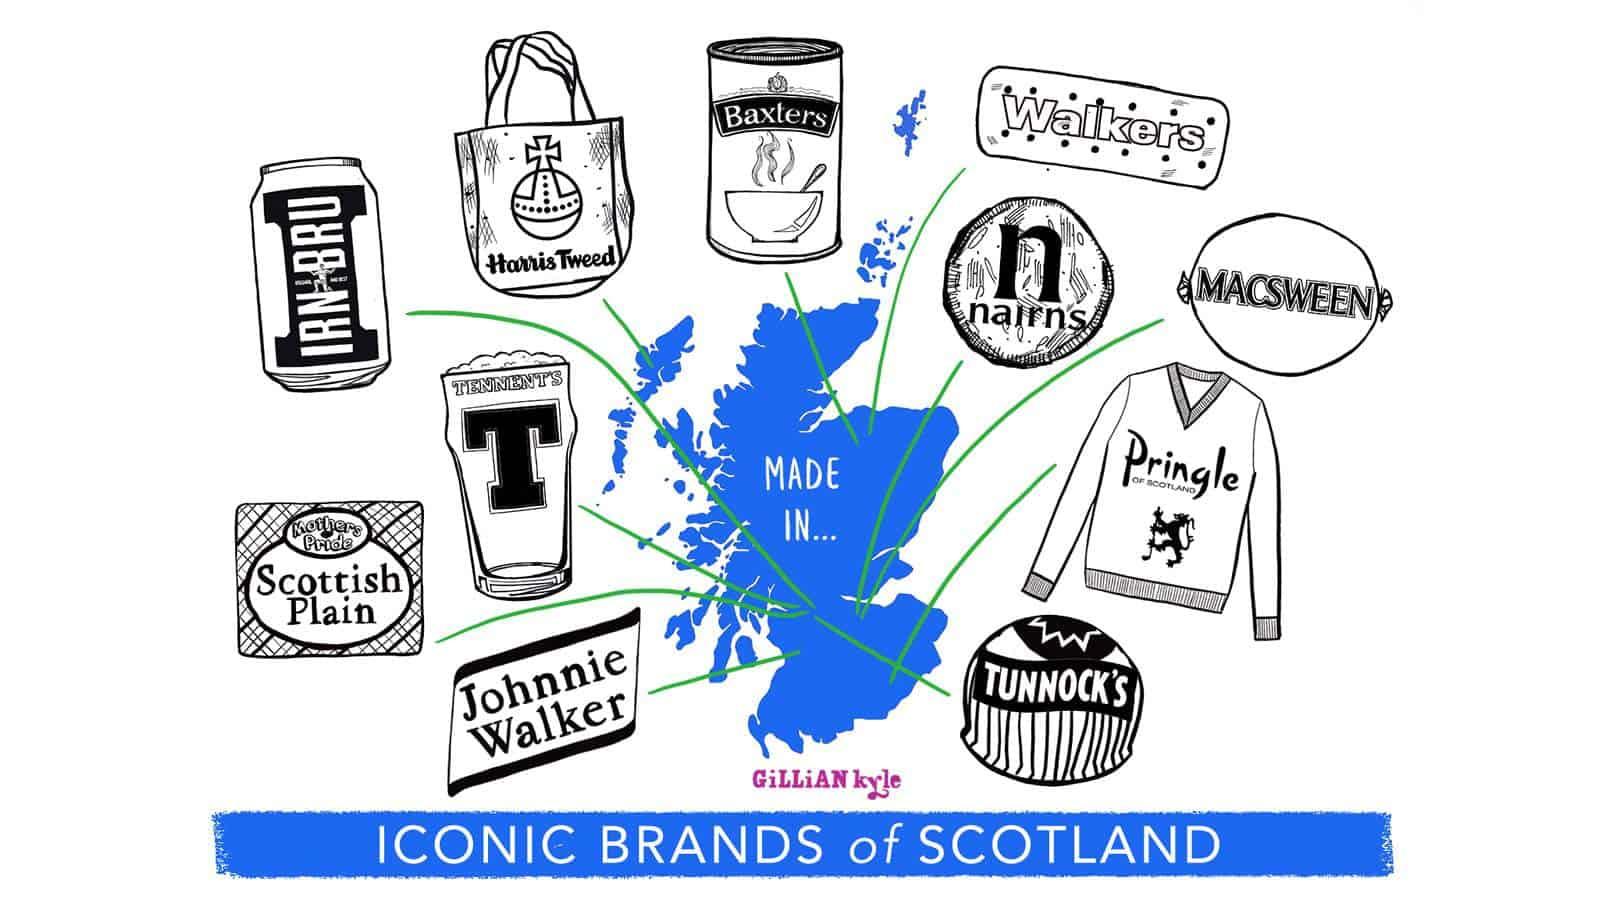 iconic brands of Scotland